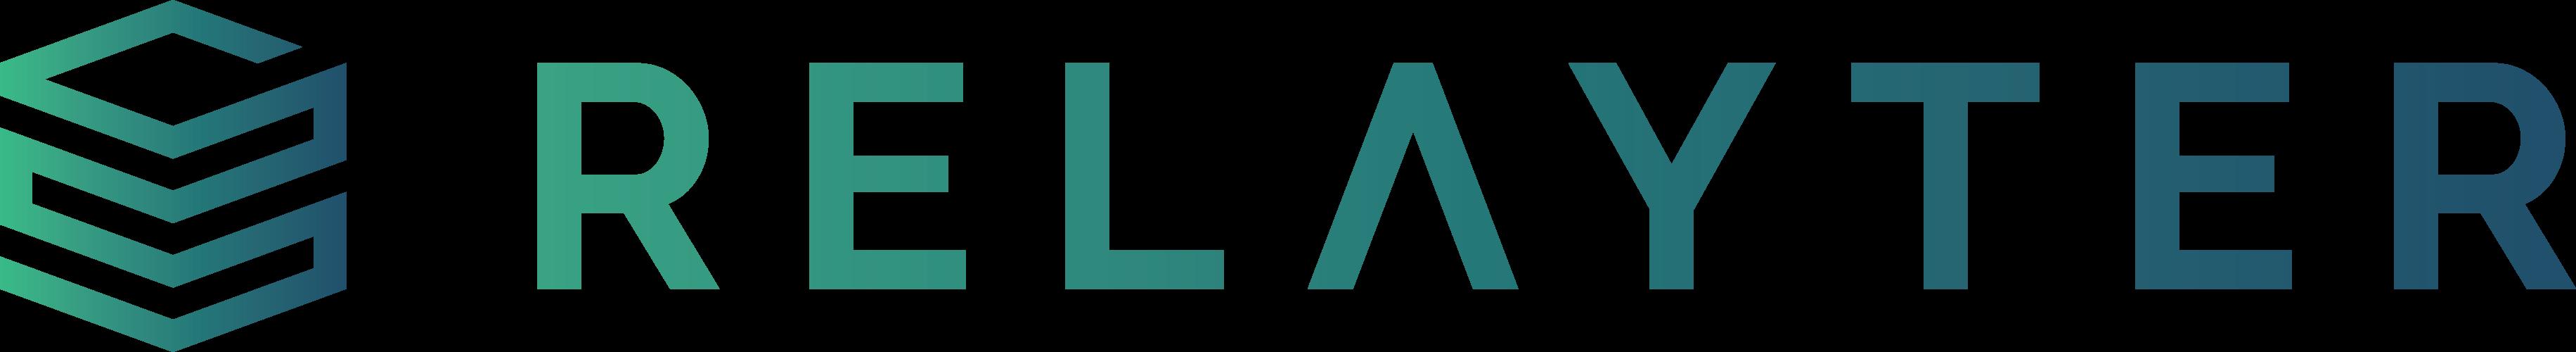 Relayter-Logo-Color